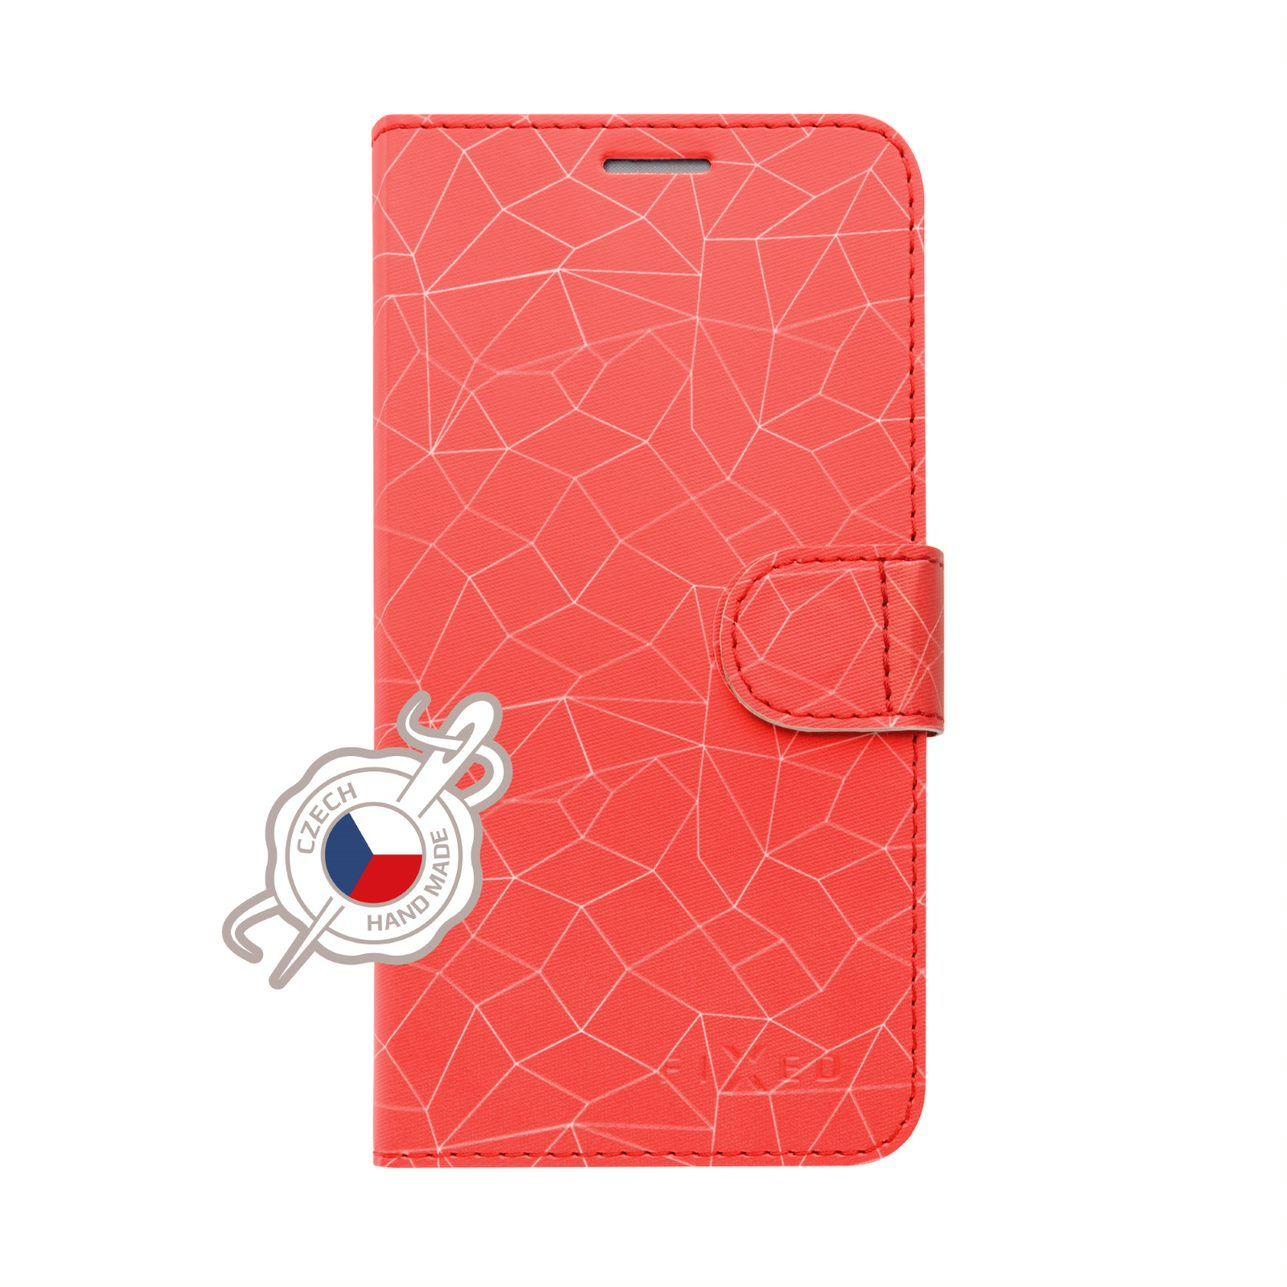 FIXED FIT flipové pouzdro pro Samsung Galaxy Xcover 4/4S, motiv Red Mesh